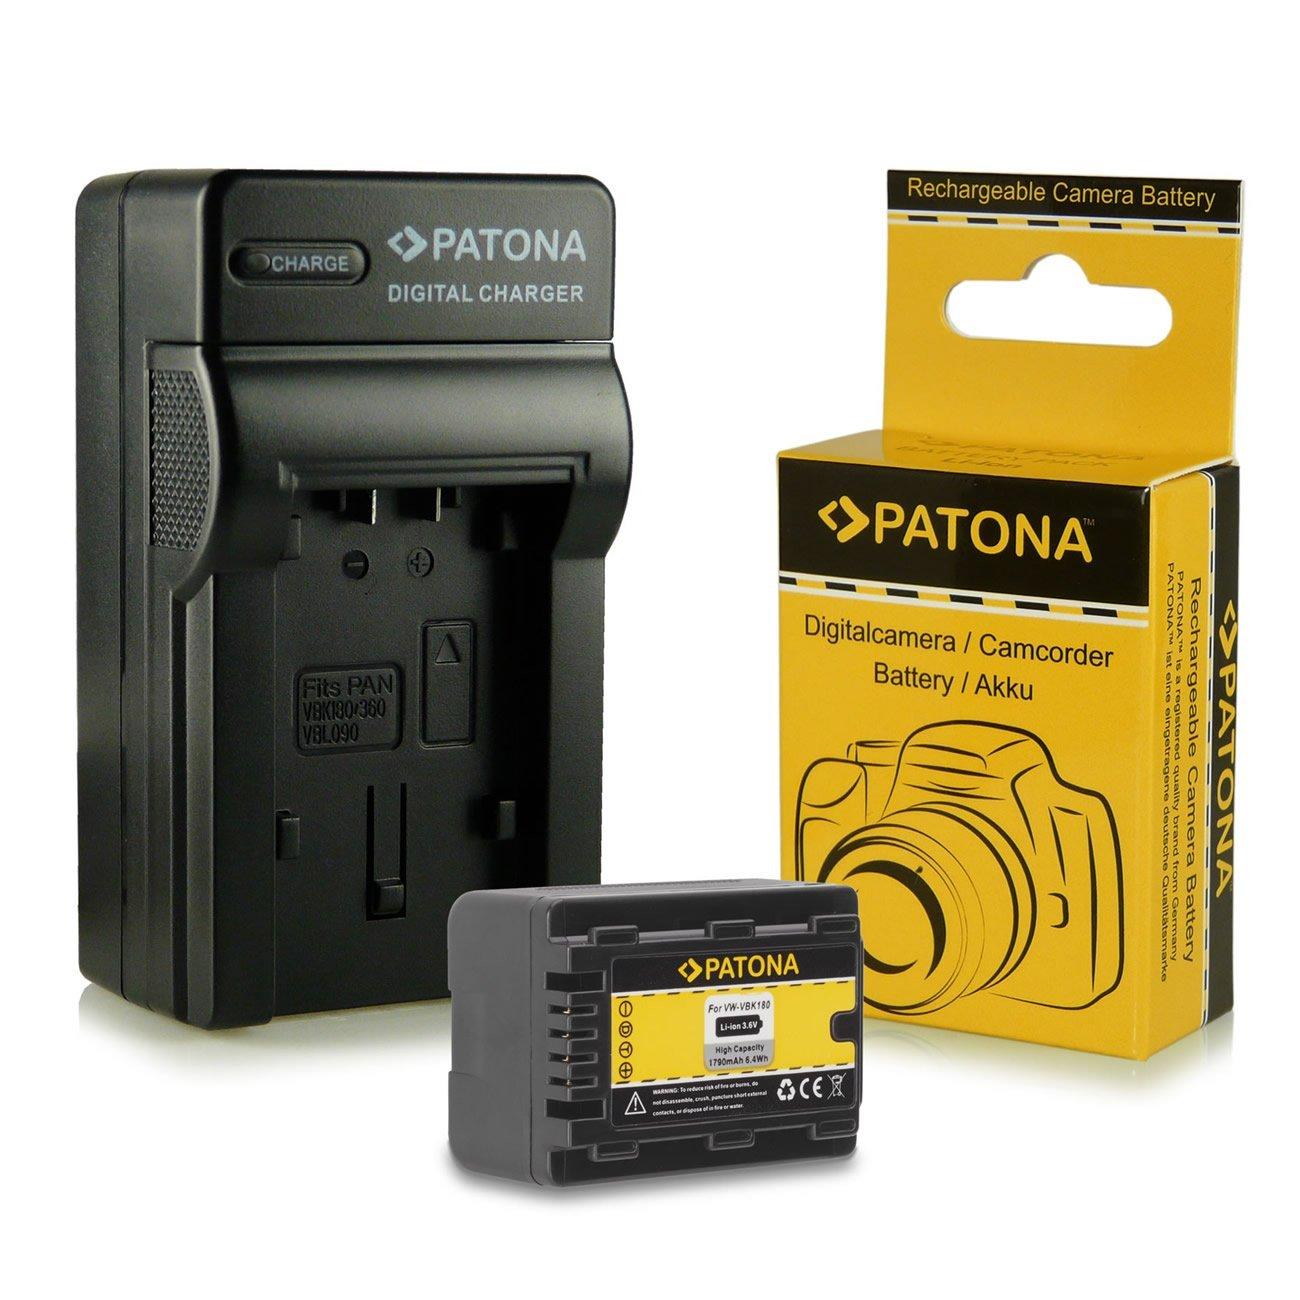 Caricabatteria + Batteria VW-VBK180 per Panasonic Camcorder HC-V10 | HC-V100 | V100M | HC-V500 | V500M | HC-V700 | V700M | HC-V707 | V707M | HDC-HS60 | HDC-HS80 | HDC-SD40 | HDC-SD60 | HDC-SD66 | HDC-SD80 | HDC-SD90 | HDC-SD99 | HDC-SDX1 | HDC-TM40 | HDC-T